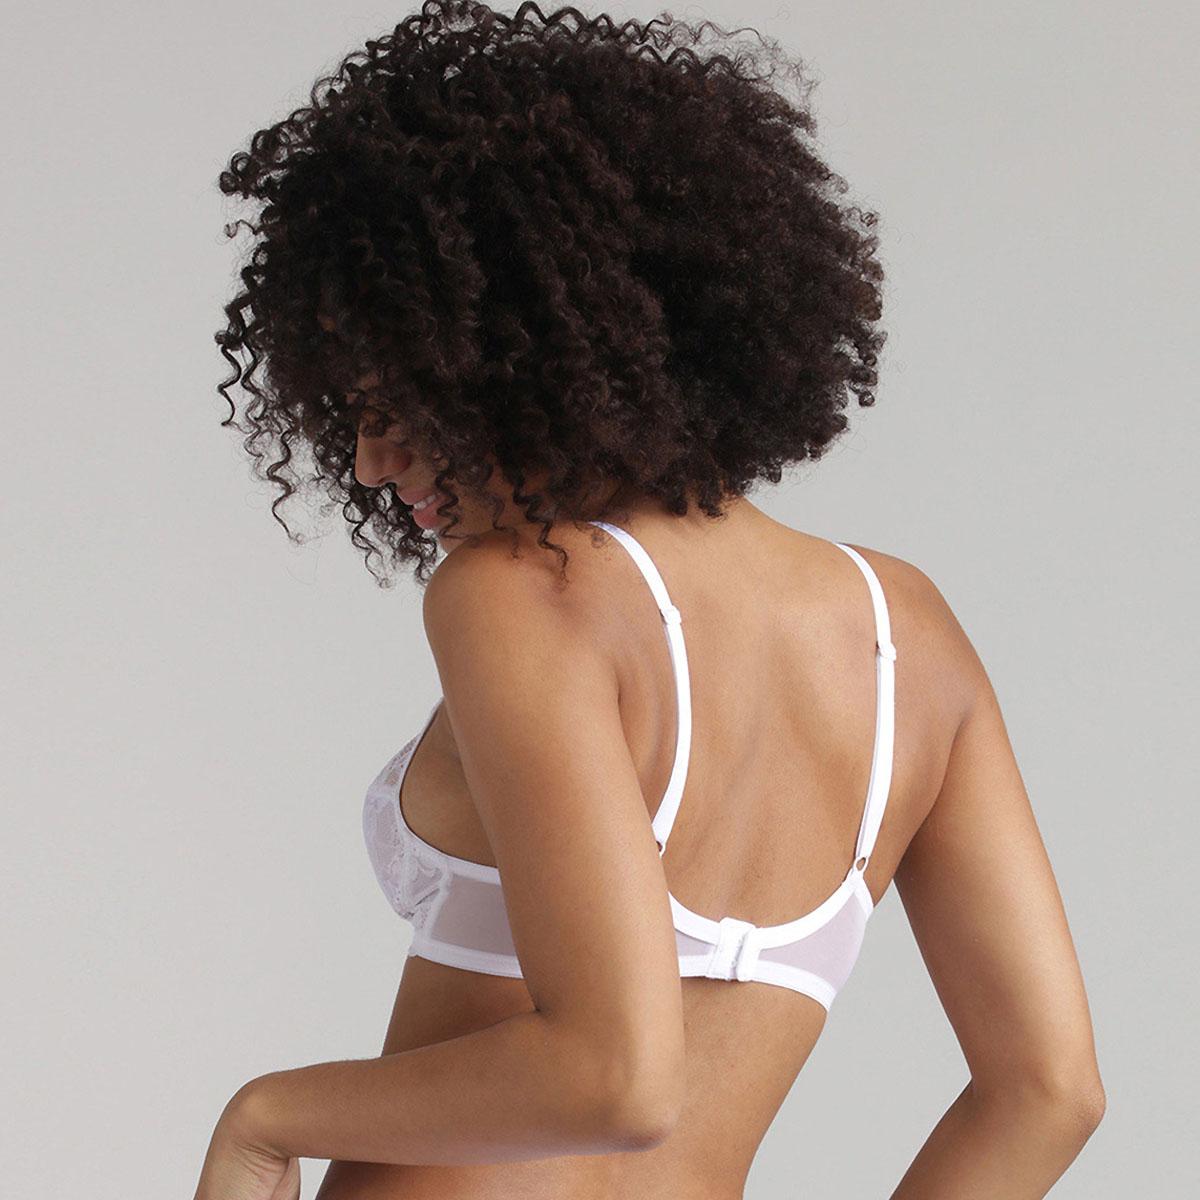 Reggiseno balconcino senza ferretto bianco Essential Elegance, , PLAYTEX